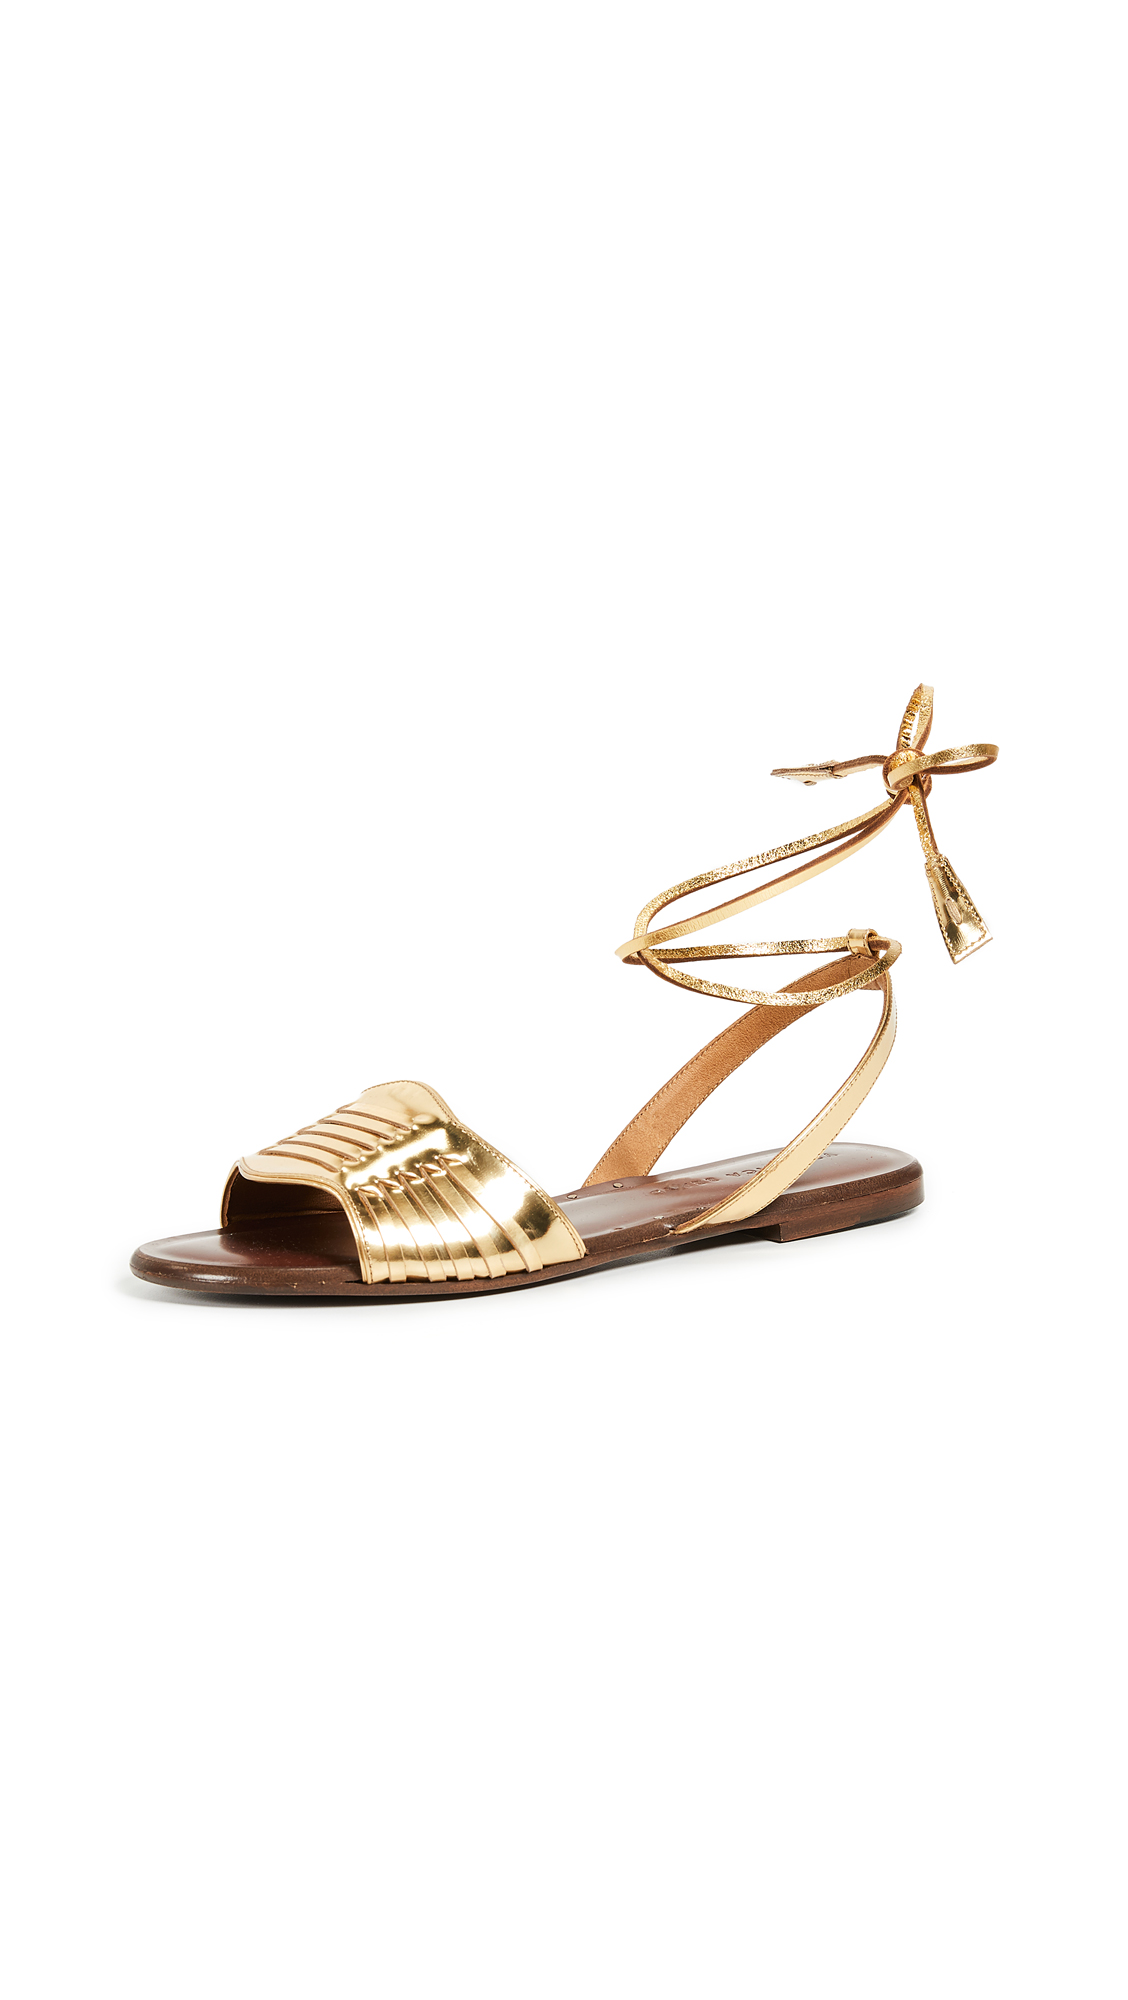 Veronica Beard Fawn Tie Sandals